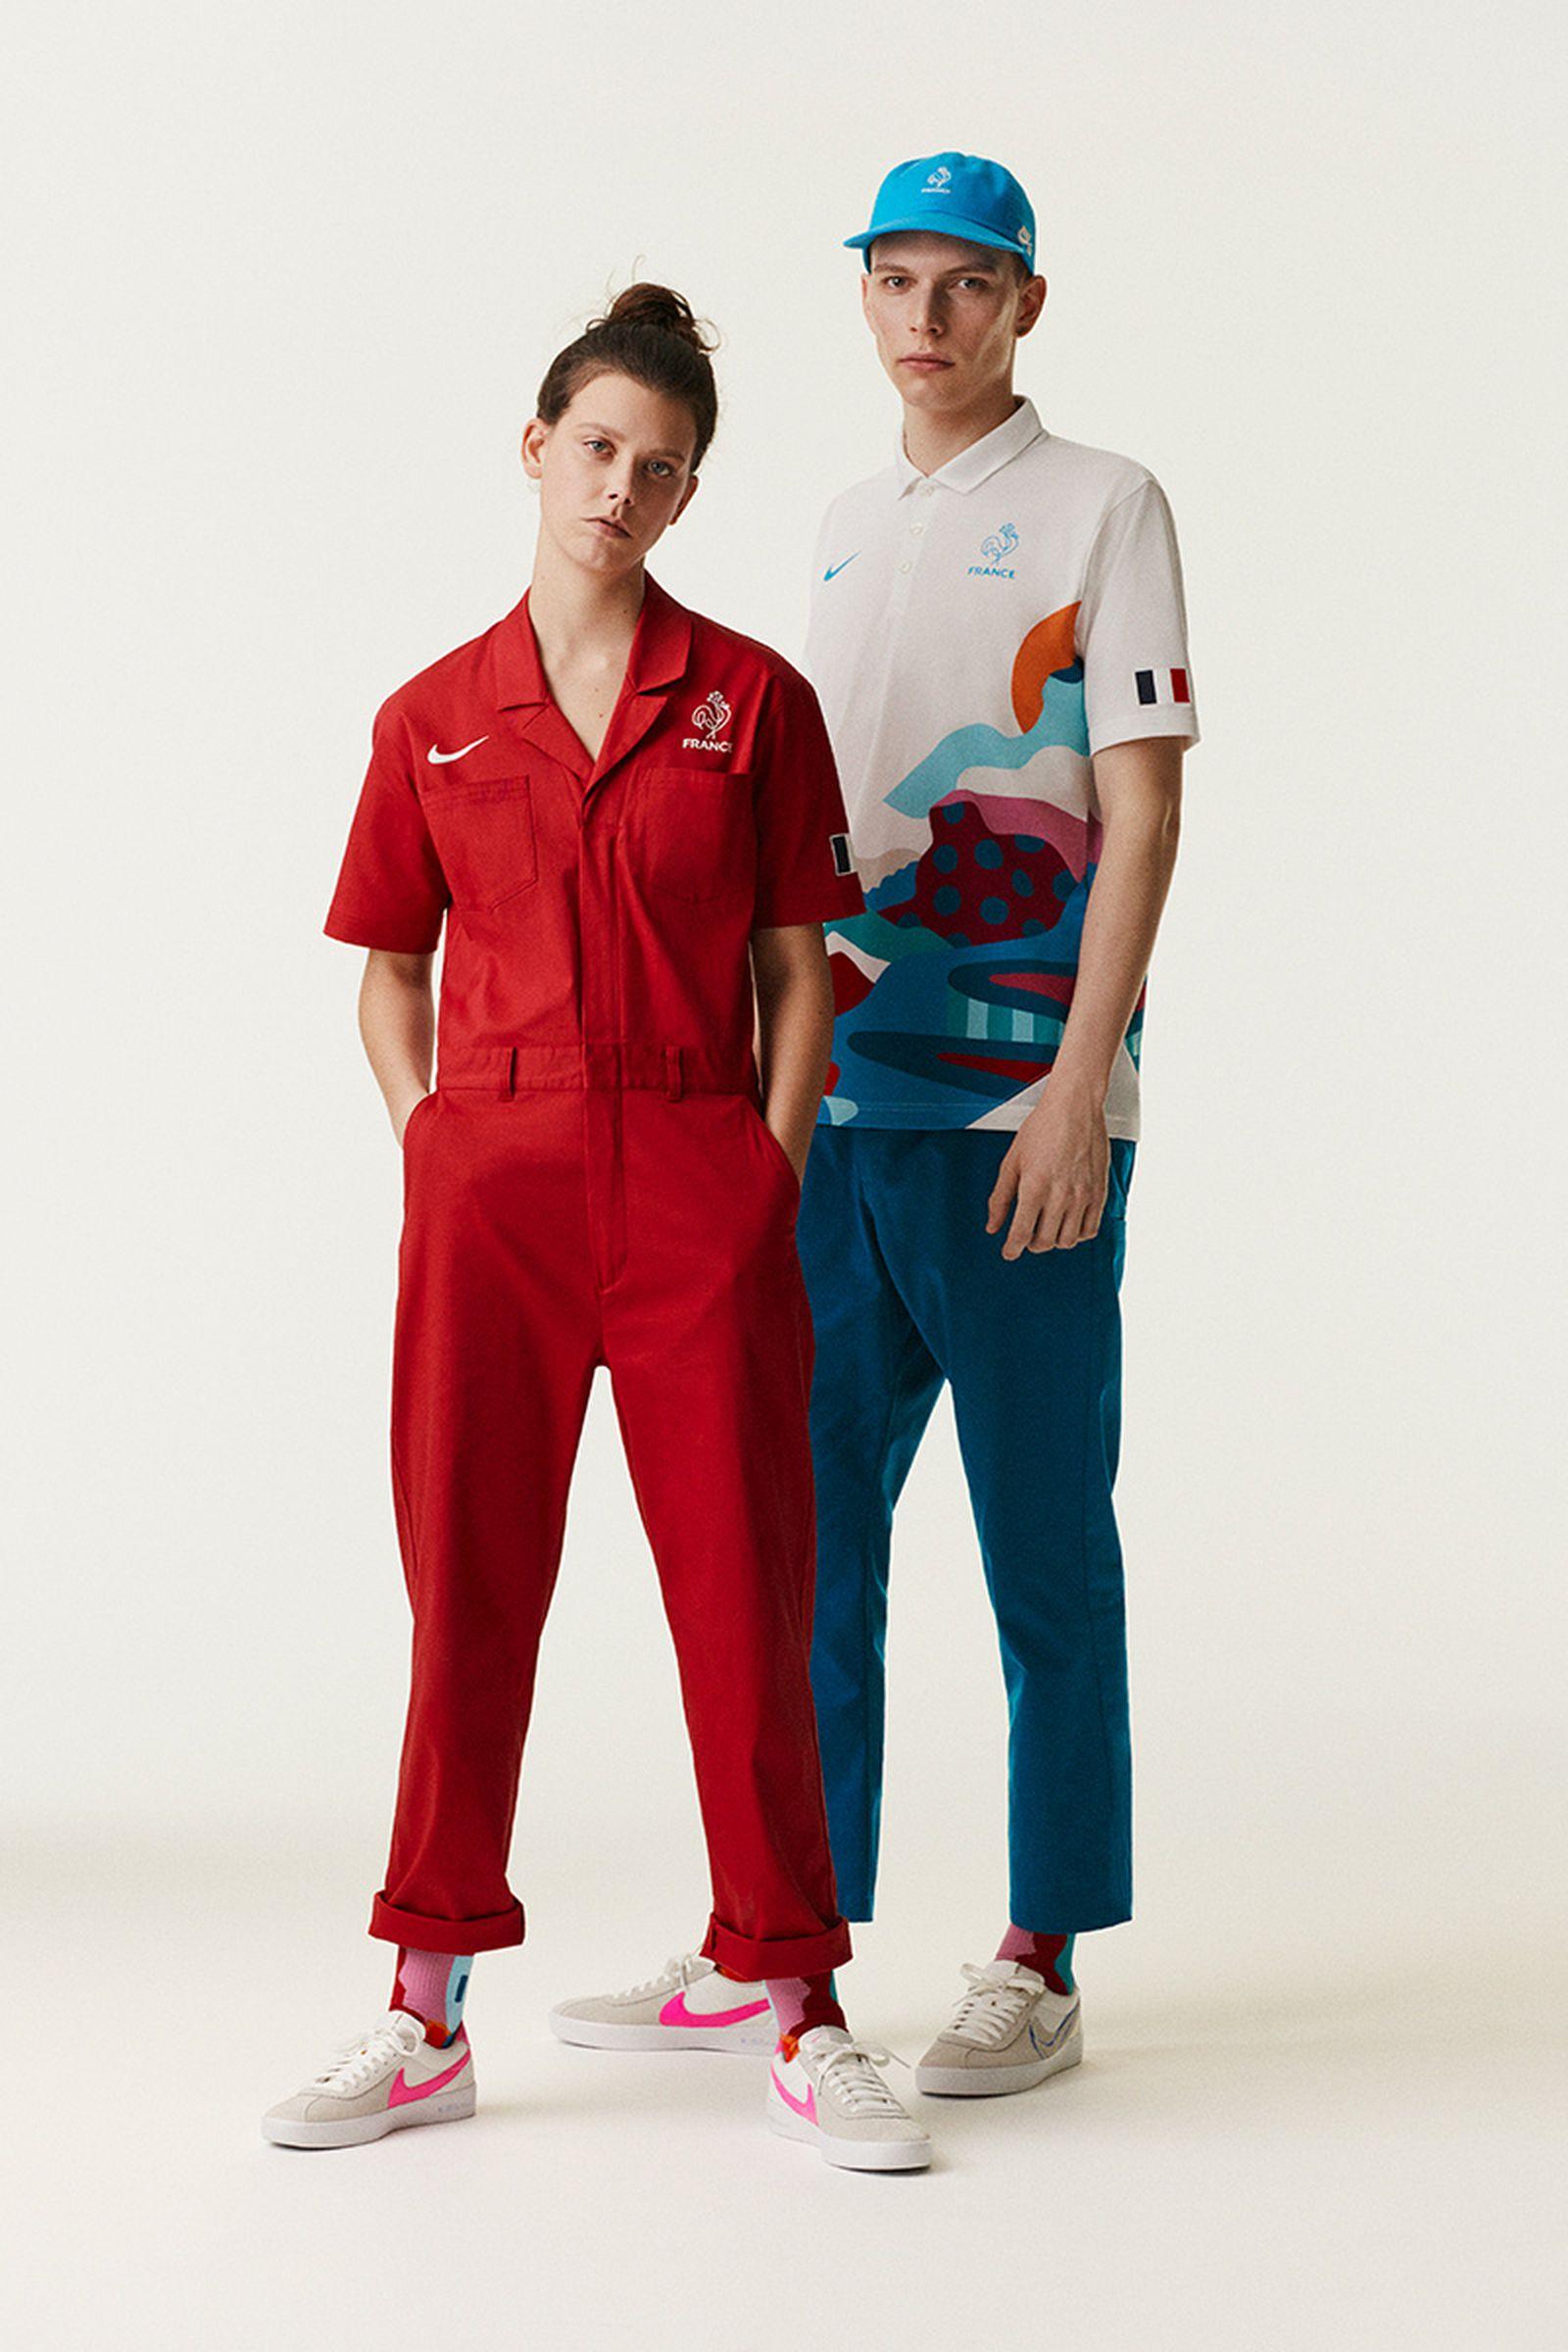 nike-sb-tokyo-olympics-skateboarding-uniforms-01